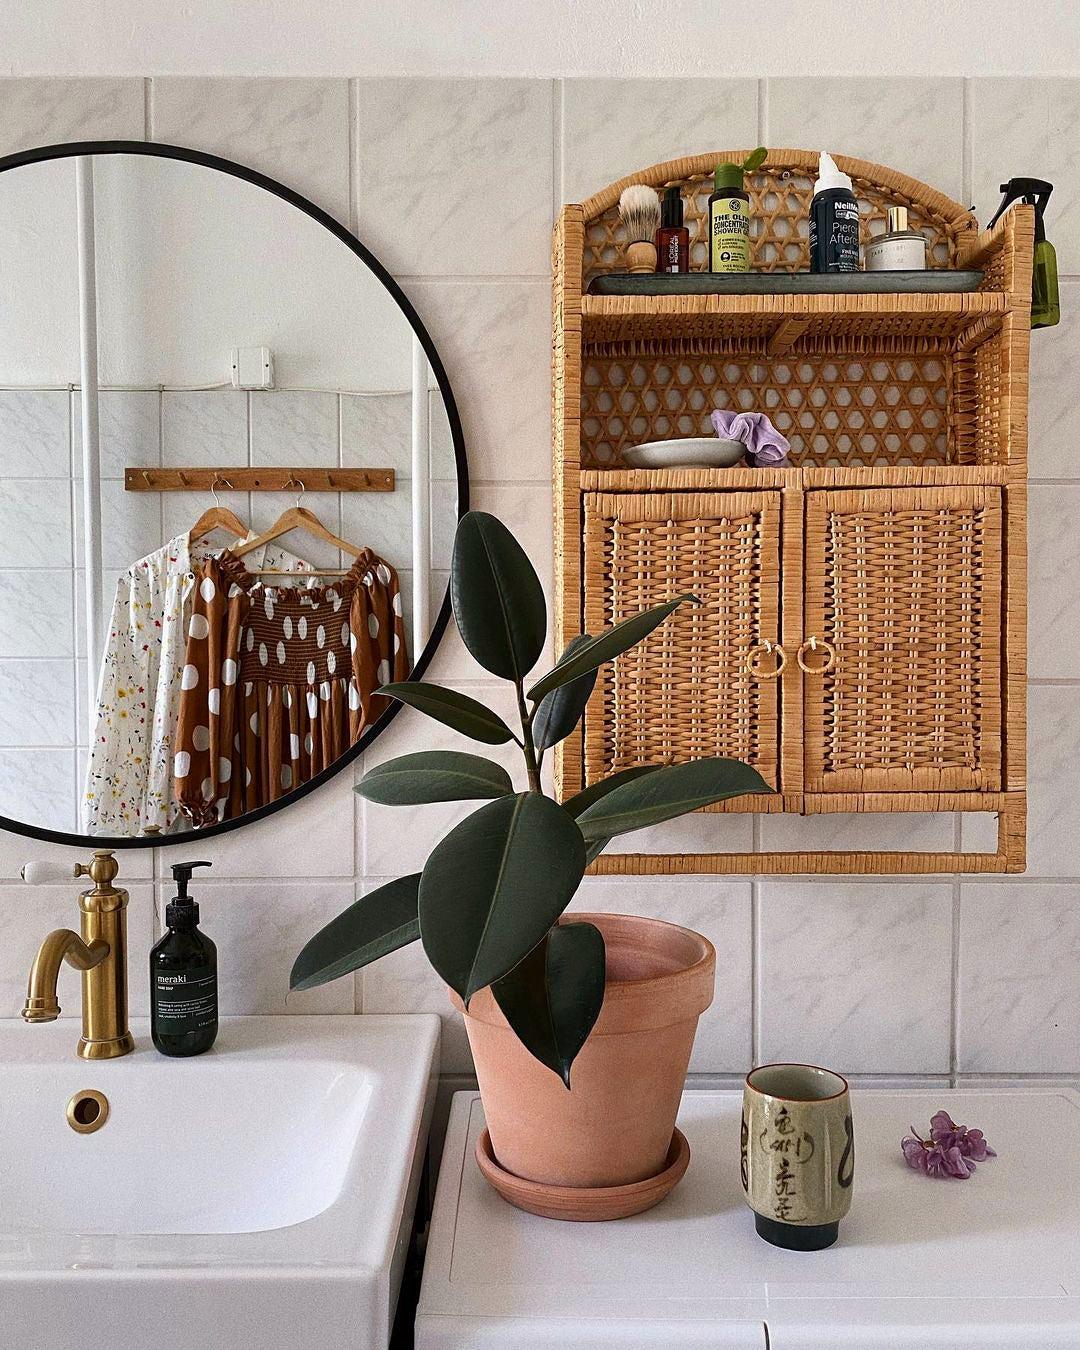 rattan shelving unit in bathroom